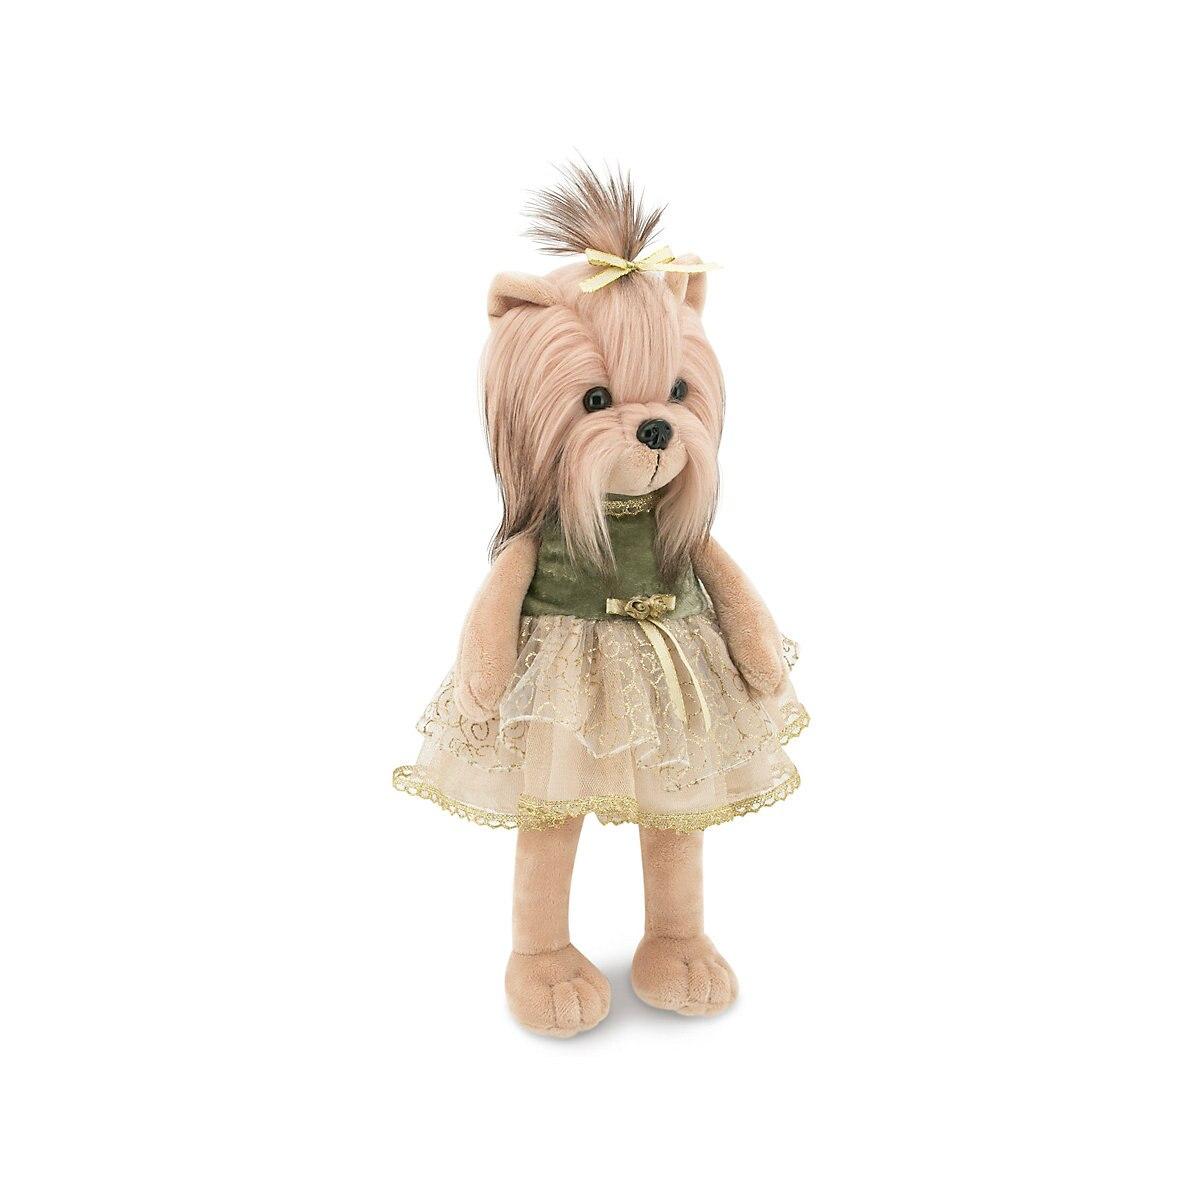 ORANGE TOYS Stuffed & Plush Animals 8316939 Soft Toy Friend Animal Girl Boy Play Game Girls Boys MTpromo